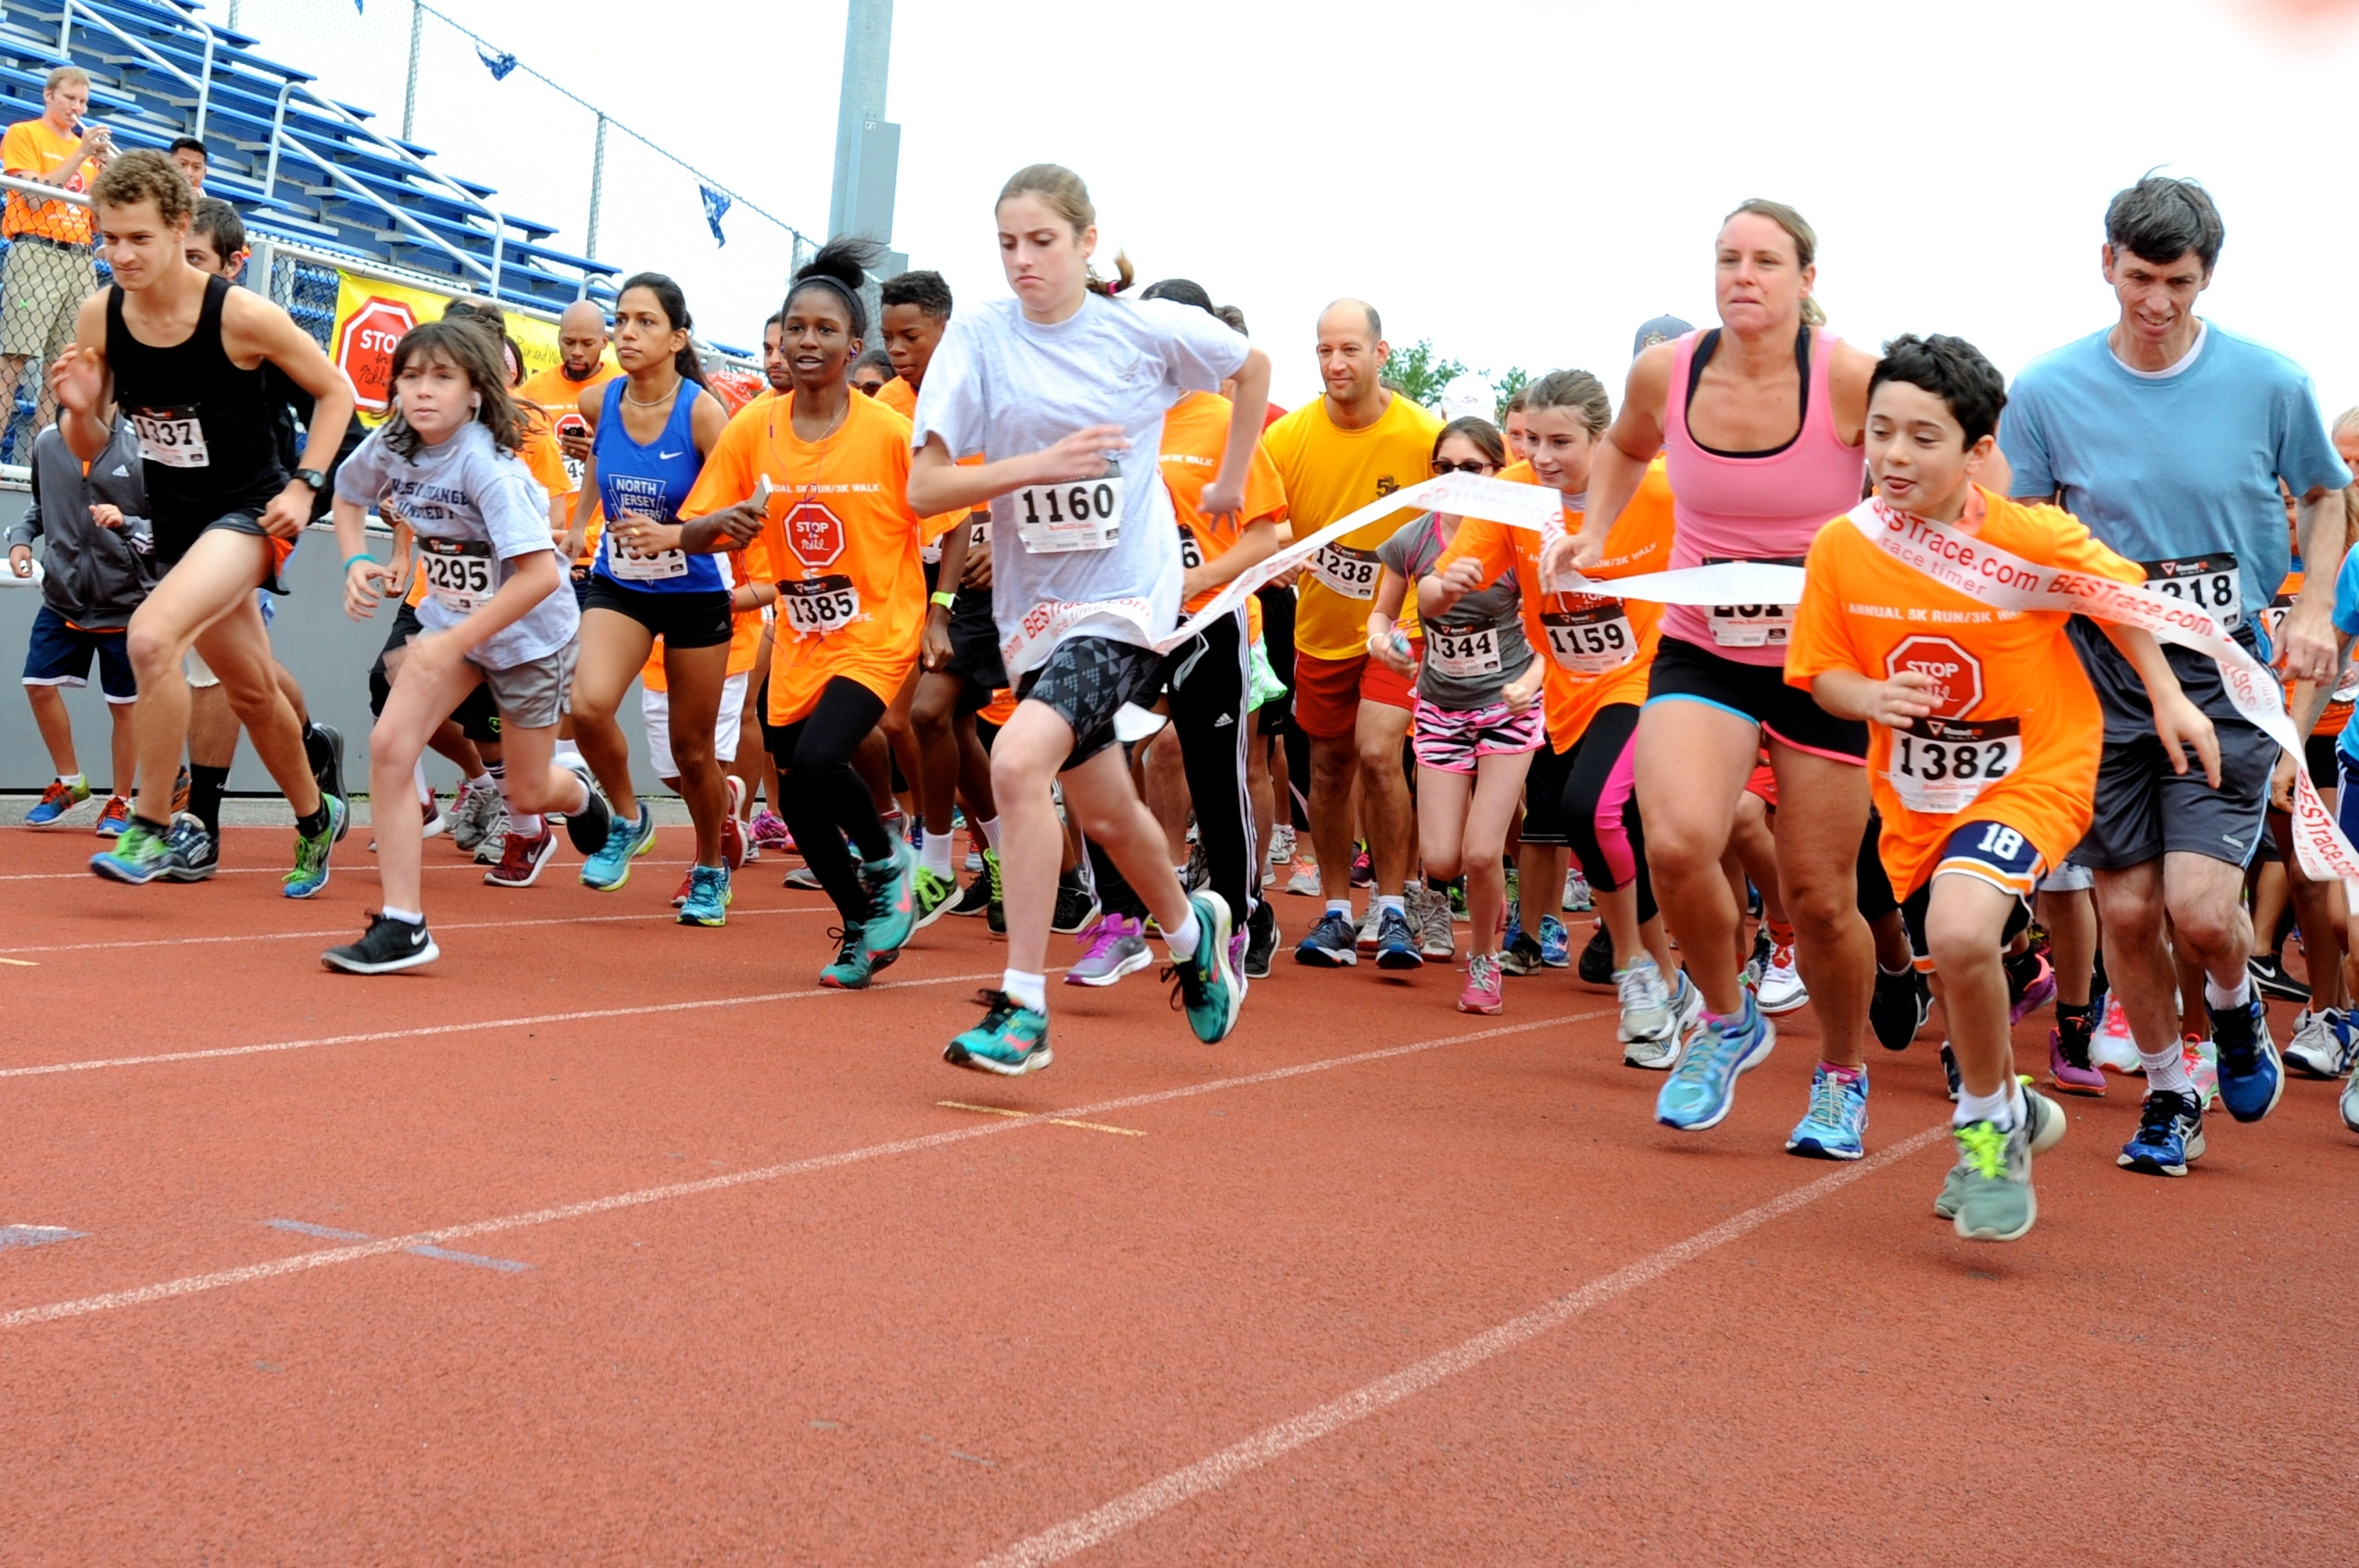 Nikhil Badlani Foundation Holds 5th Annual 5K Run/Walk